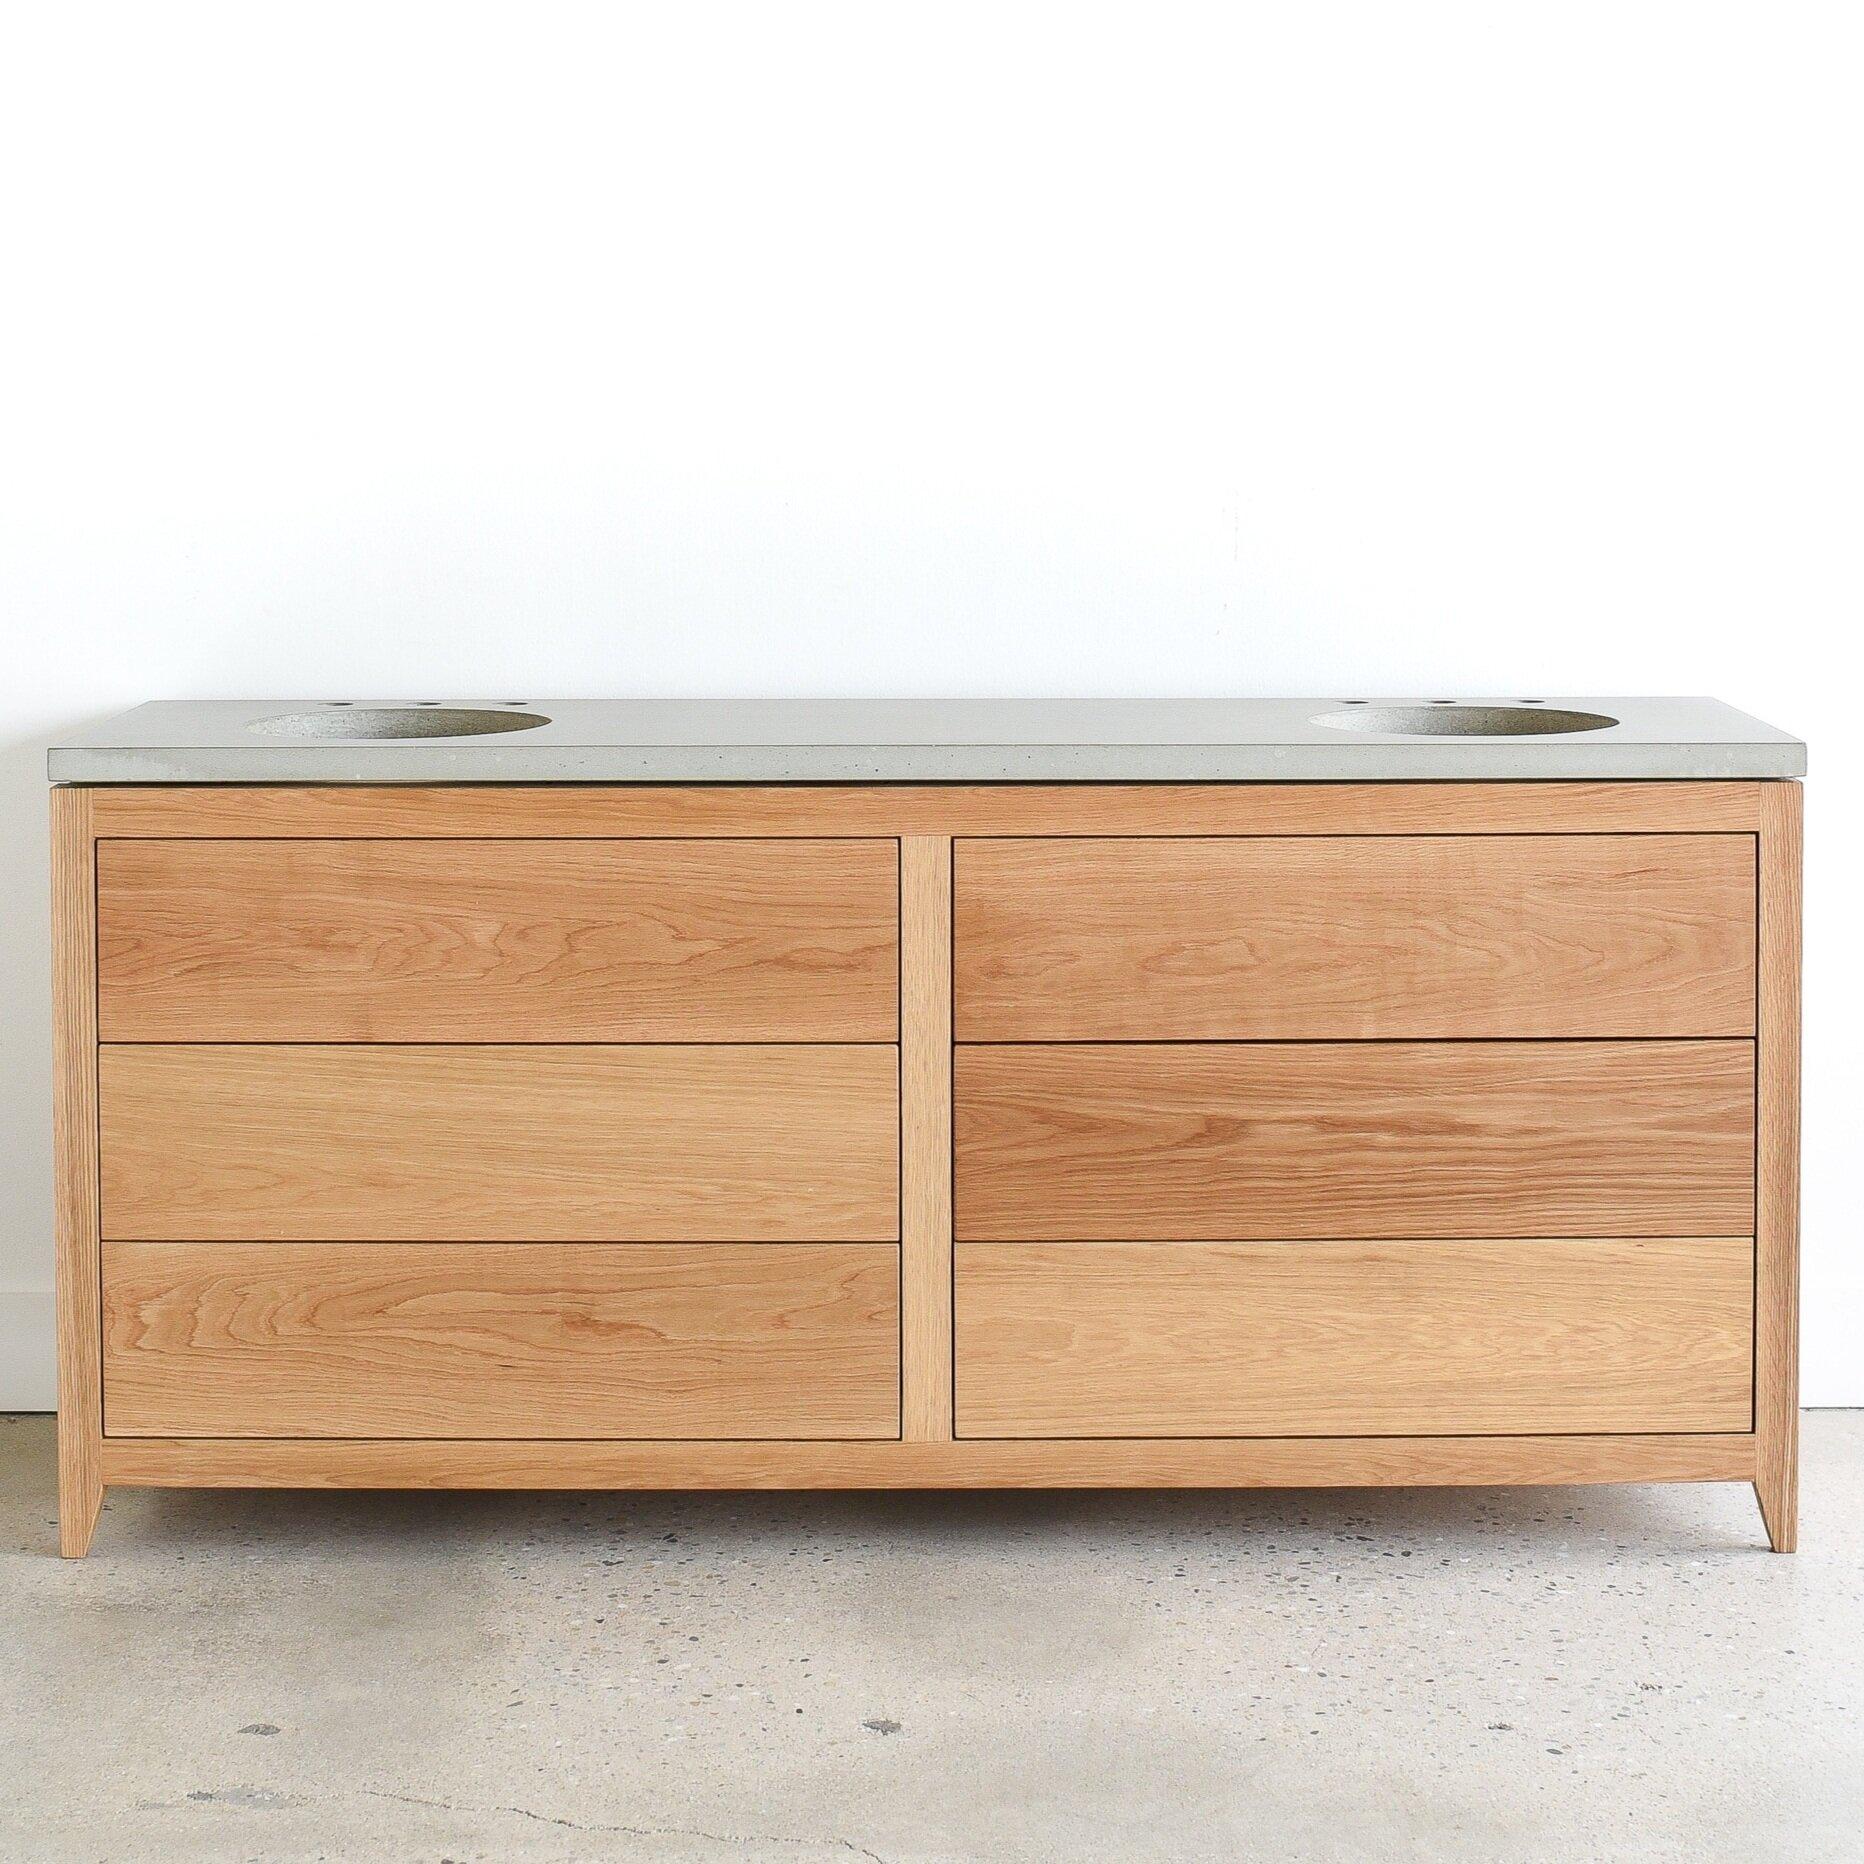 Mid Century Modern Double Sink Vanity What We Make